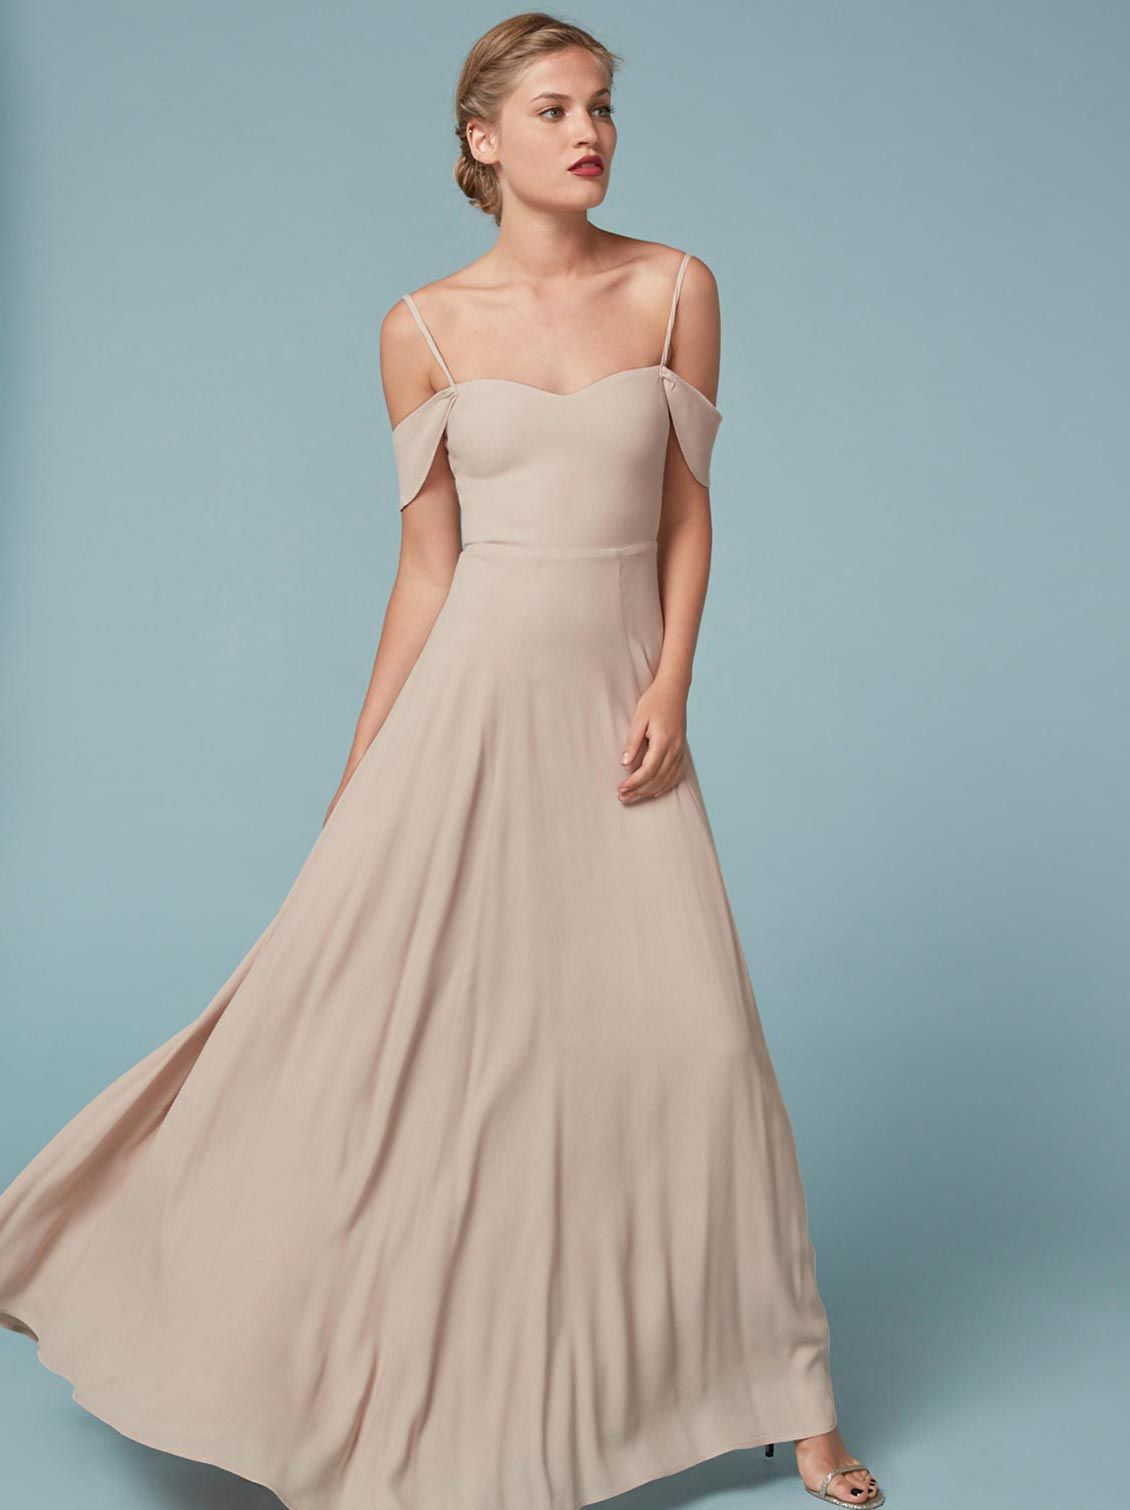 Winslow Dress   Poppy dress, Champagne and Reformation